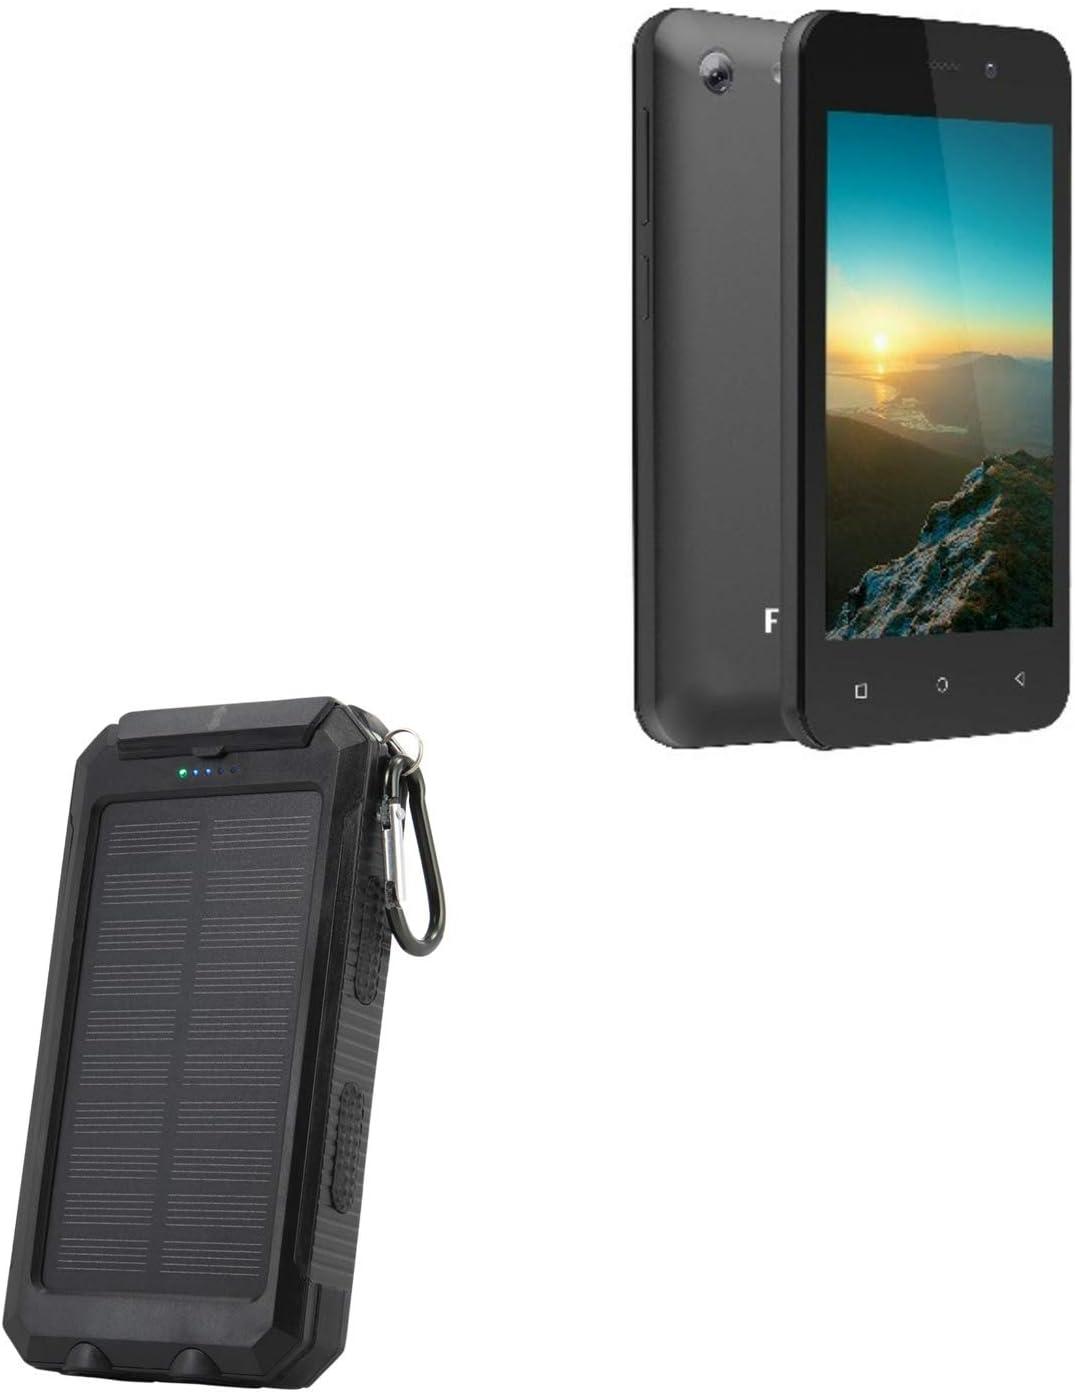 Figo Trio Battery, BoxWave [Solar Rejuva PowerPack (10000mAh)] Solar Powered Backup Power Bank 10000mAh for Figo Trio - Jet Black